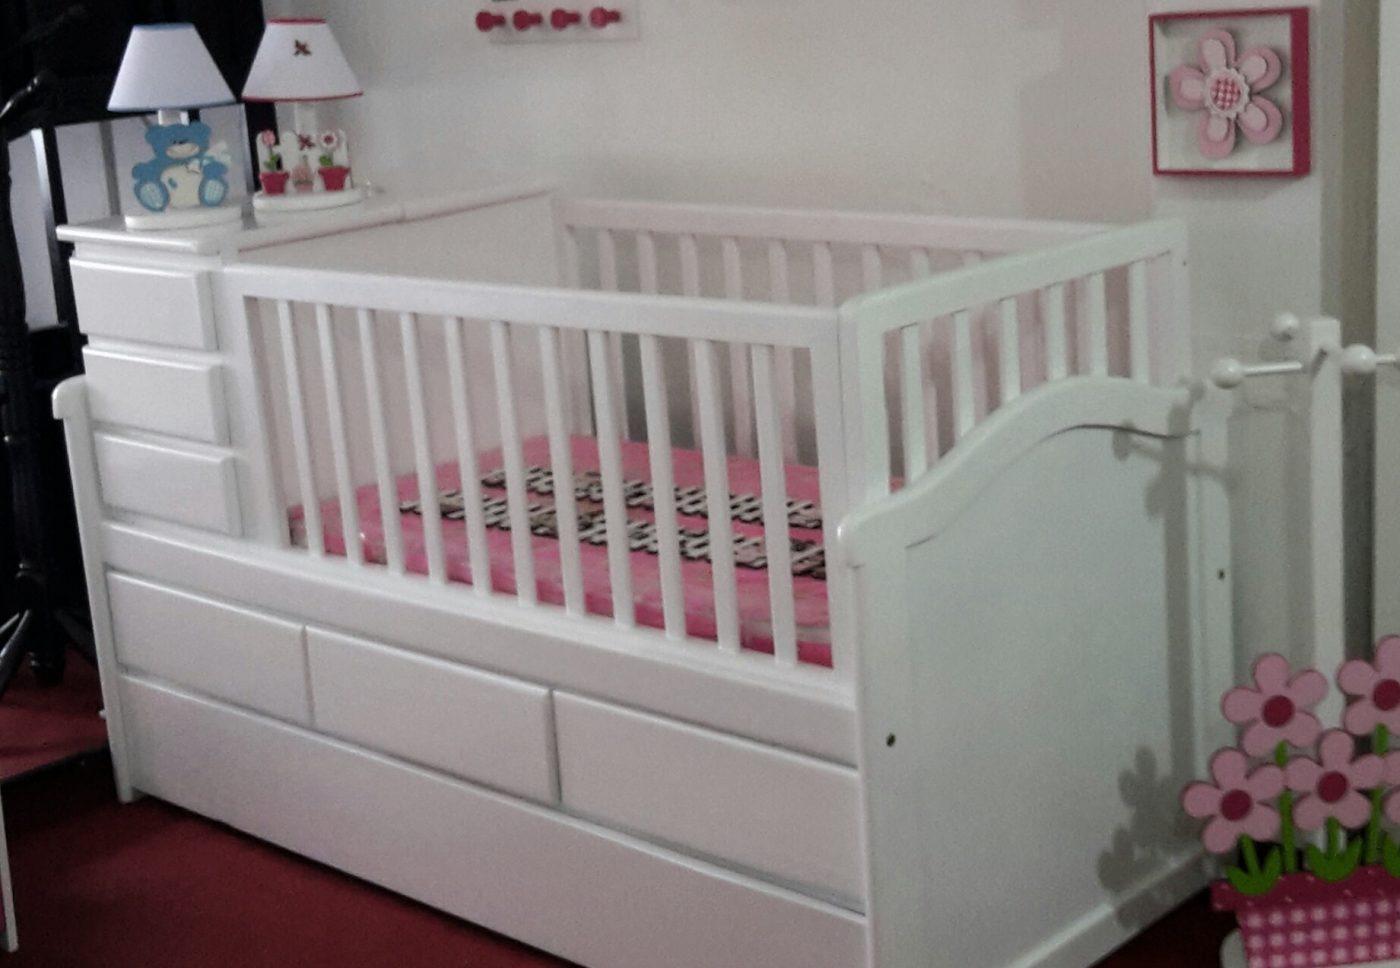 Cunas infantiles en madera omb muebles uruguay for Muebles madera maciza uruguay